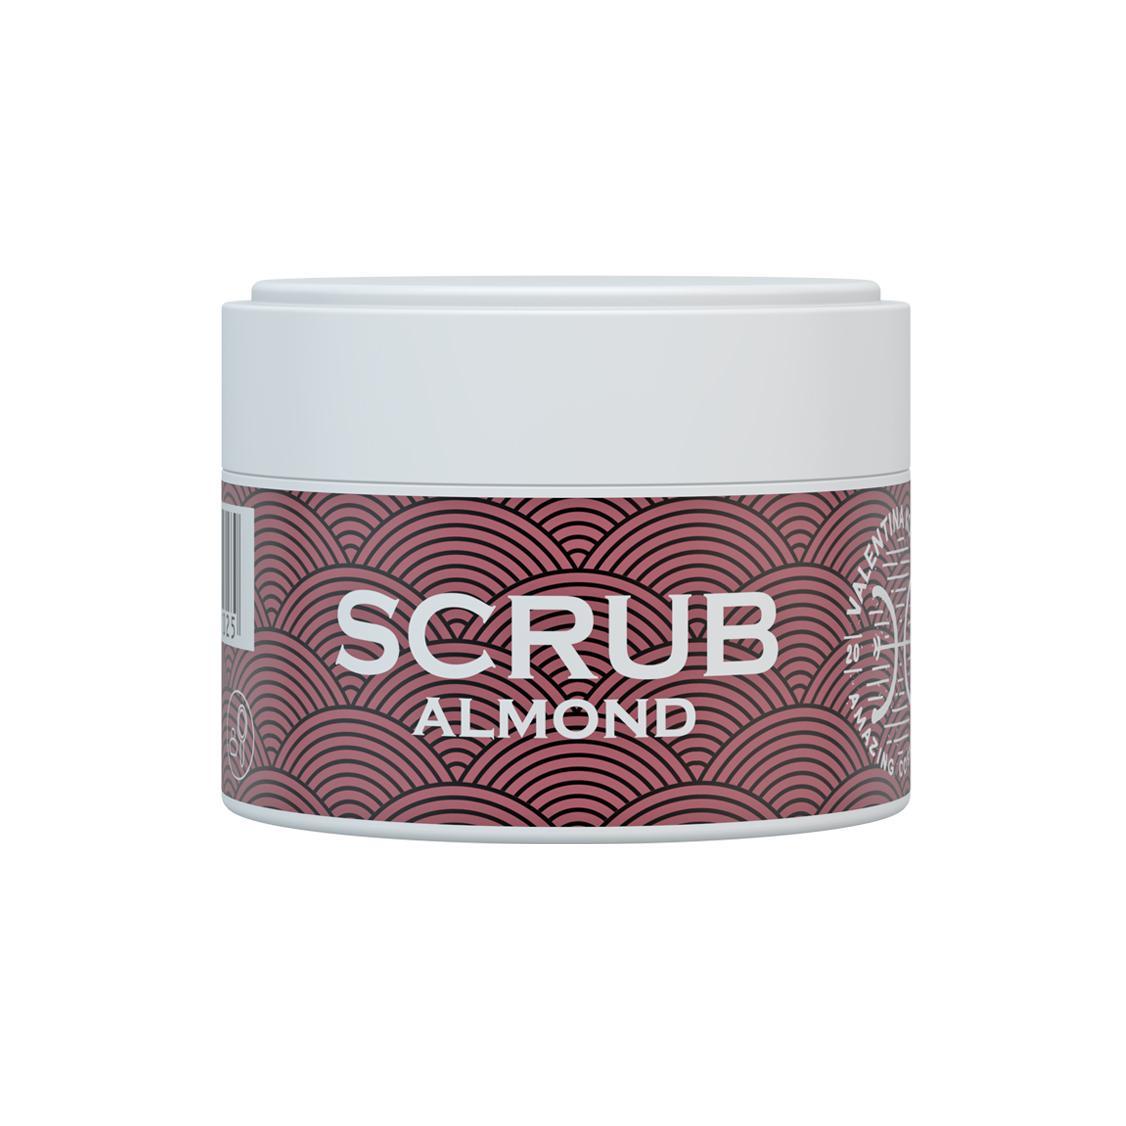 Скраб для тела Valentina Kostina Amazing Cosmetics Scrub Almond